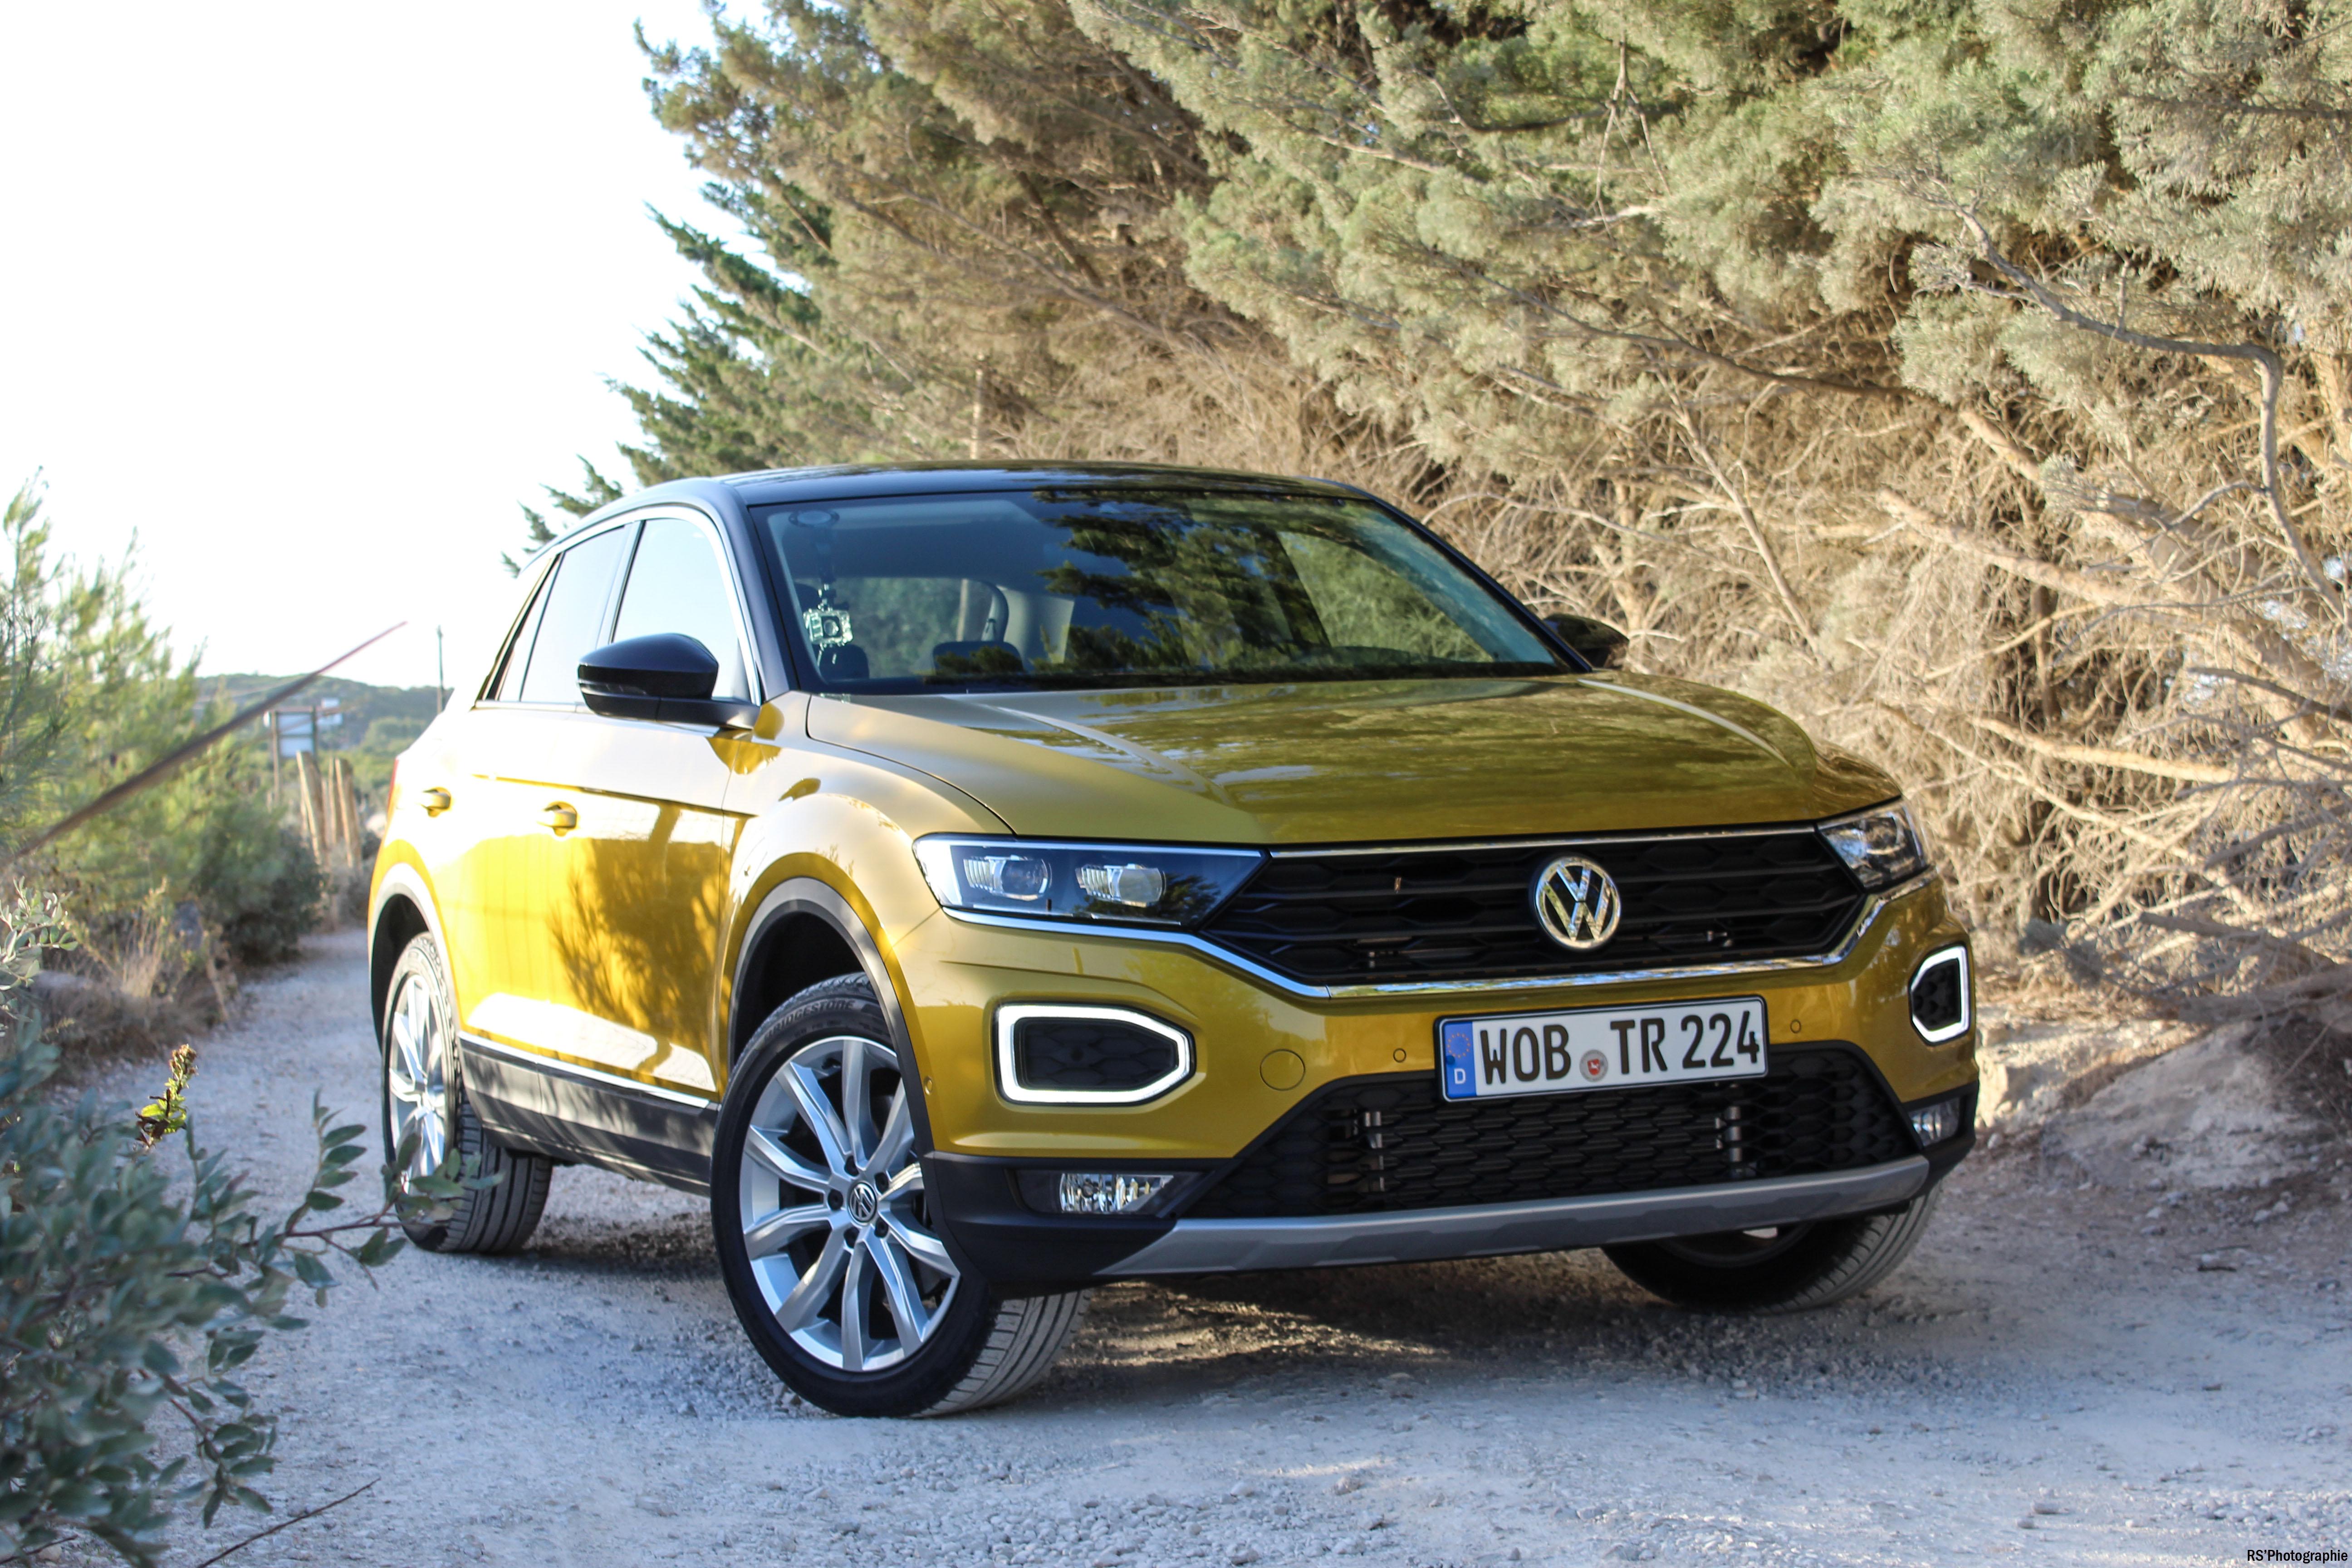 Volkswagentroc90-vw-t-roc-avant-front-Arnaud Demasier-RSPhotographie